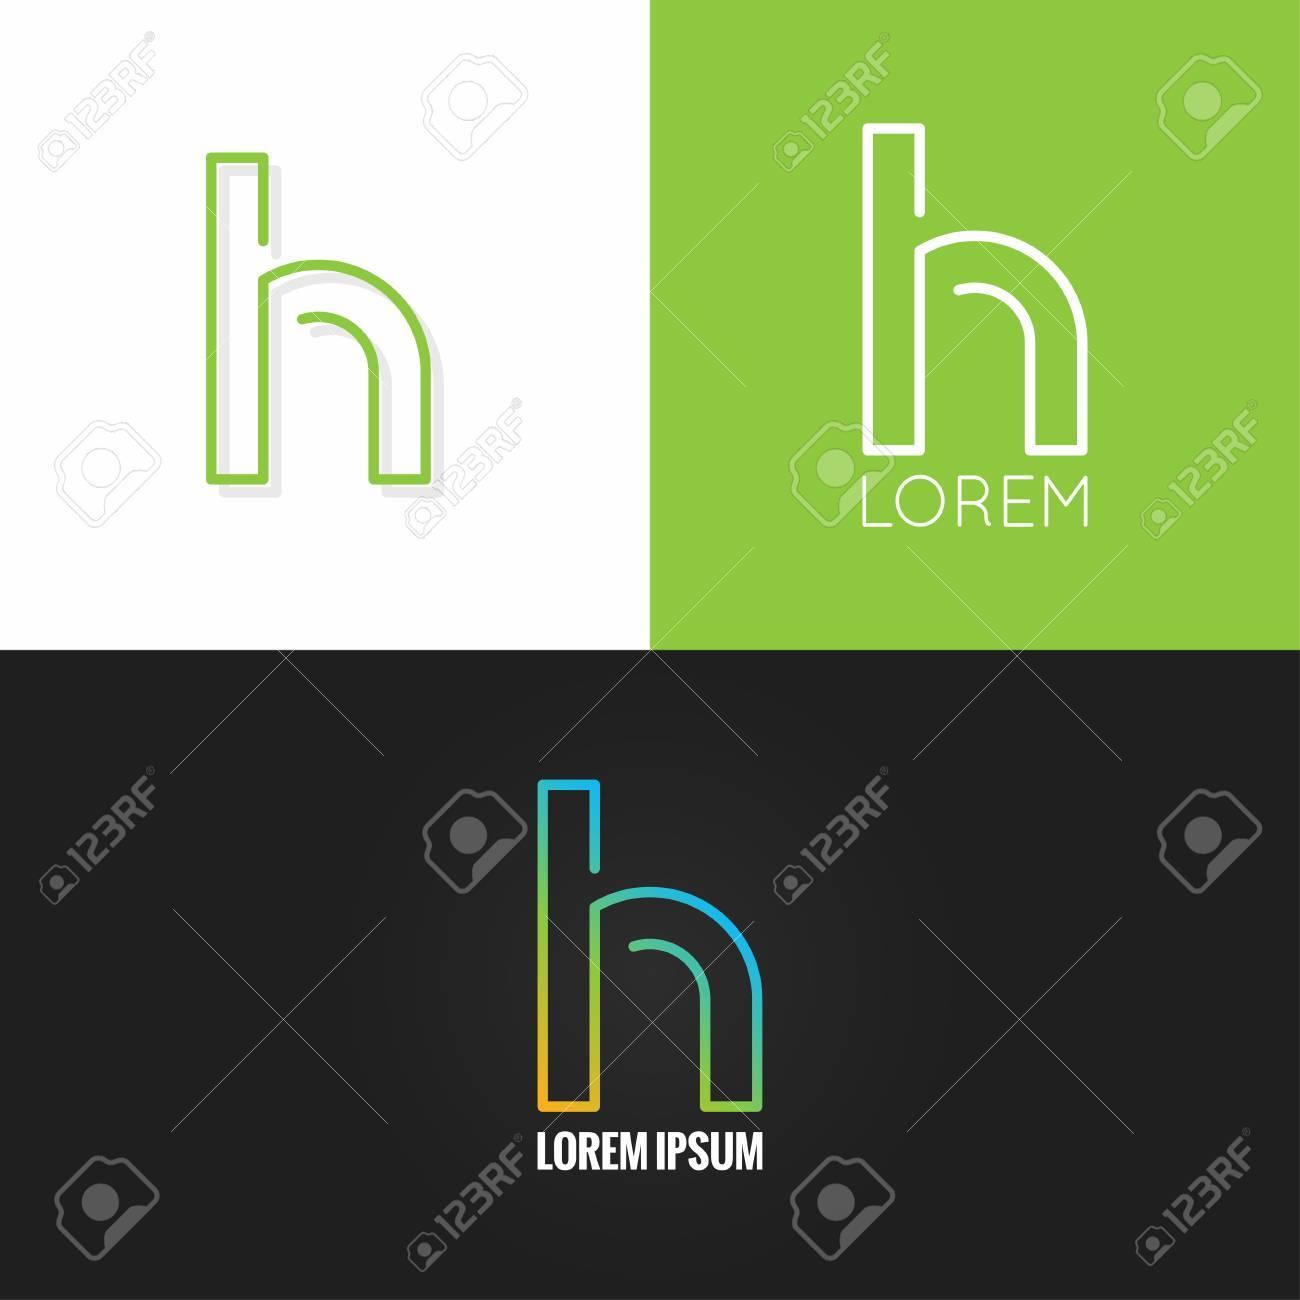 Letter H Alphabet Design Icon Set Background 10 Eps Royalty Free